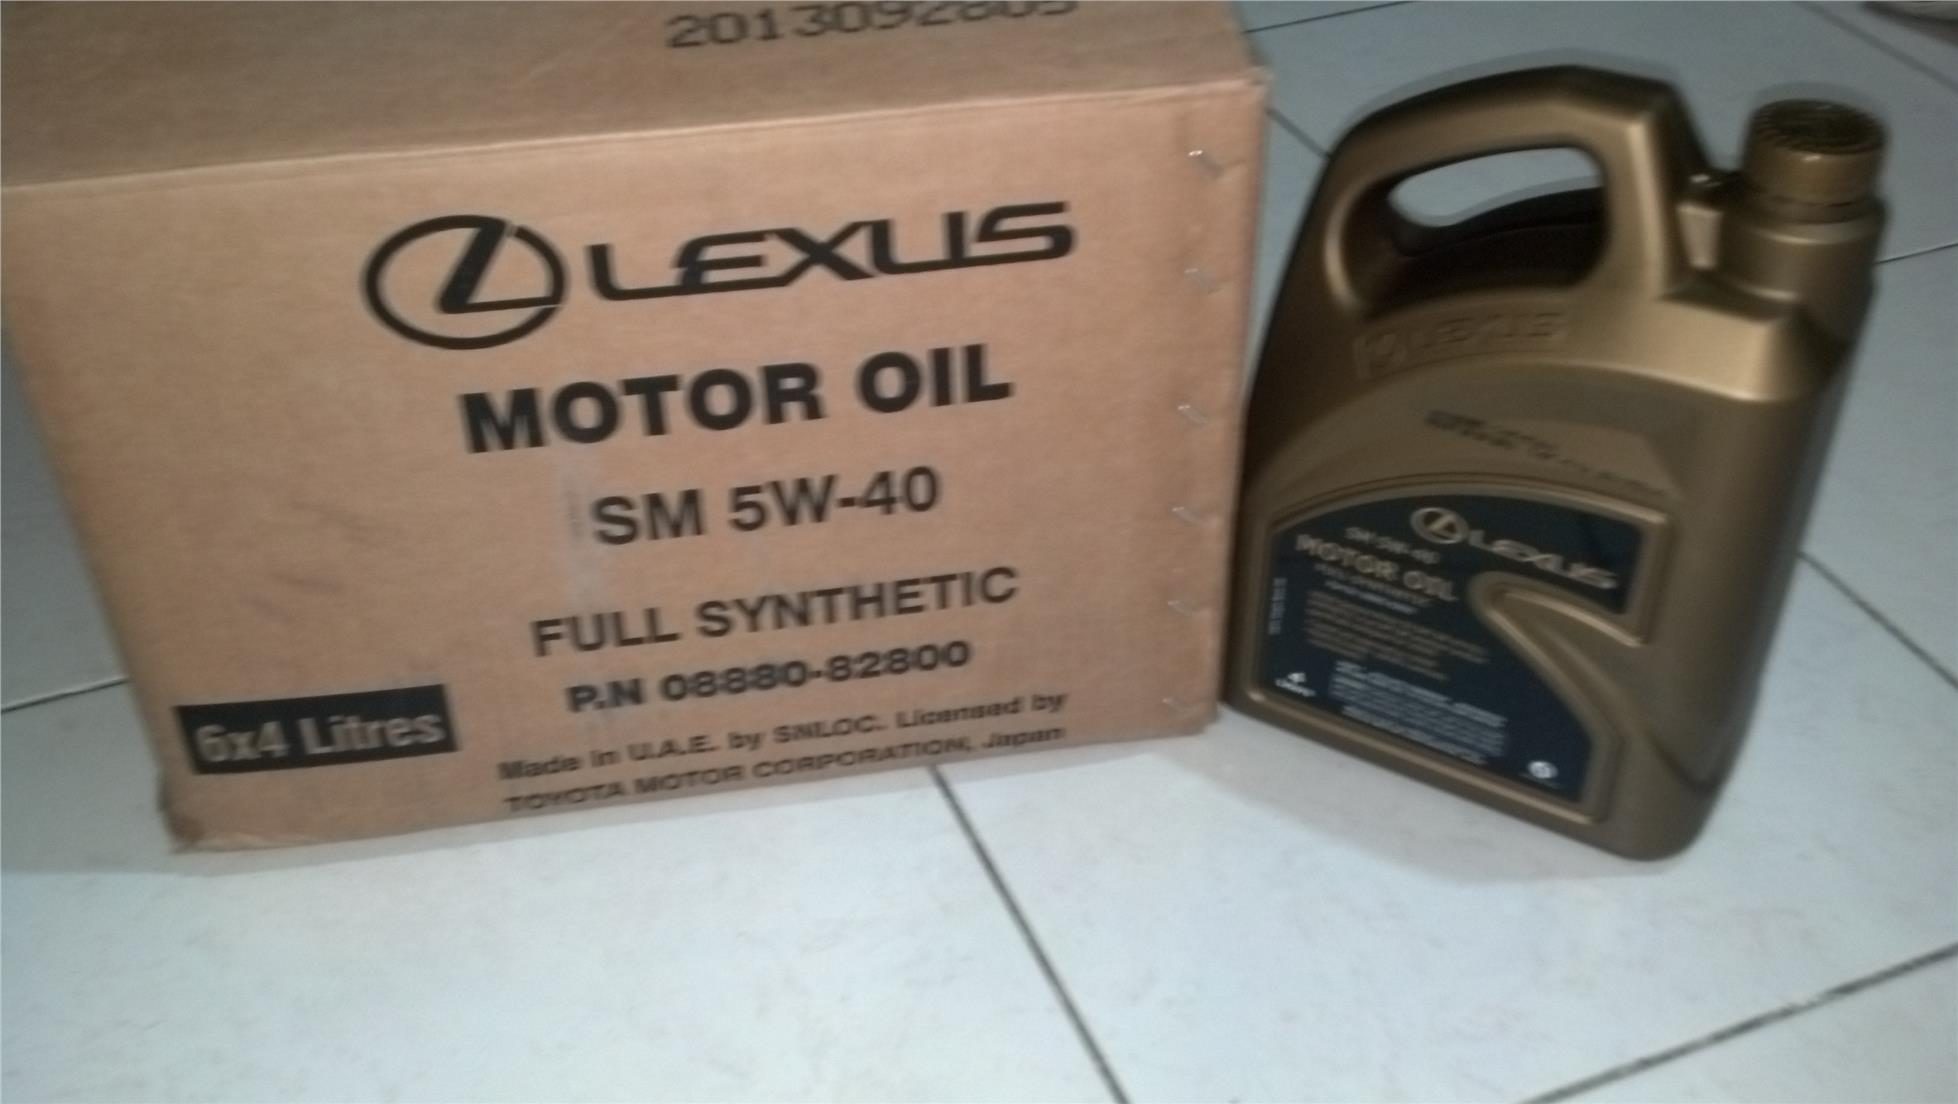 Promotion Lexus Fully Synthetic En End 4 20 2016 9 15 Pm